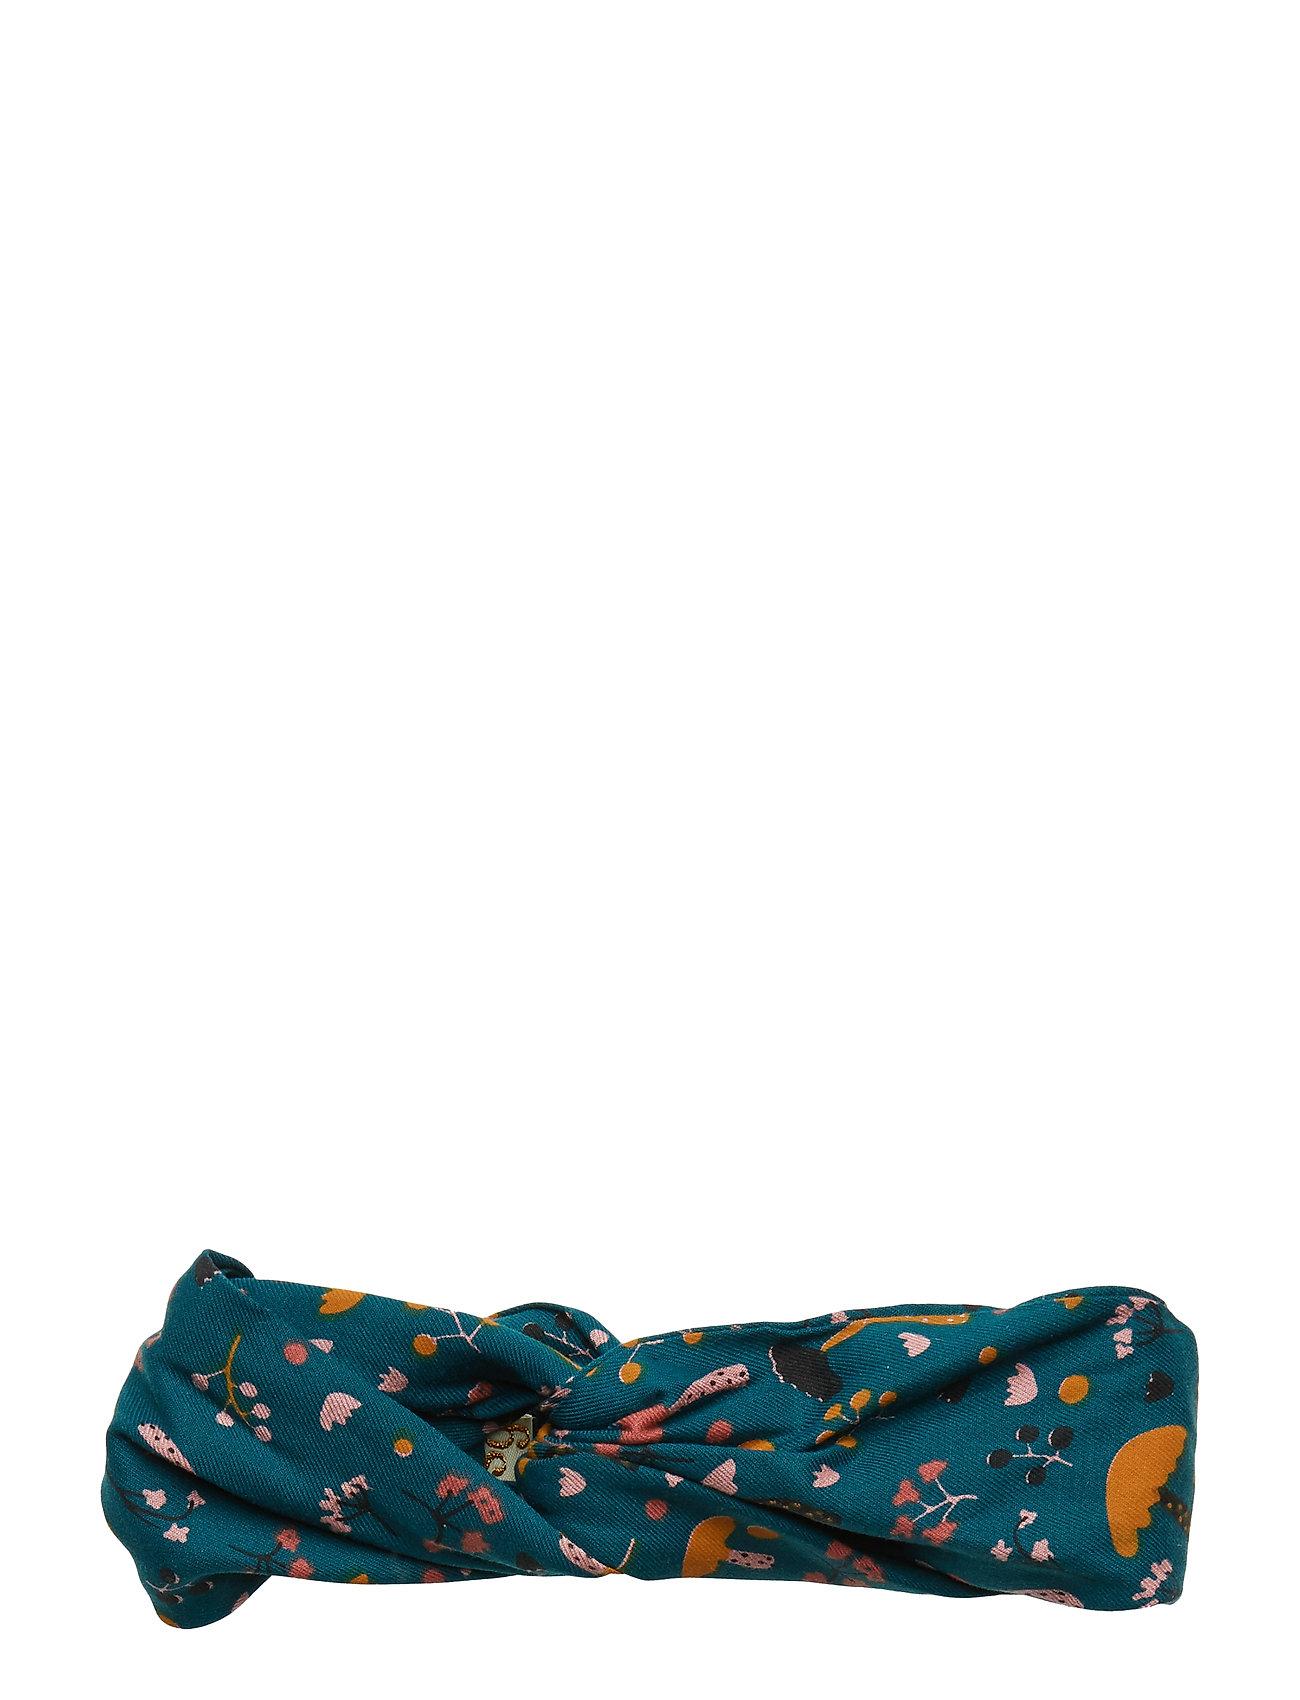 Soft Gallery Wrap Hairband - DEEP TEAL, AOP FUNGI